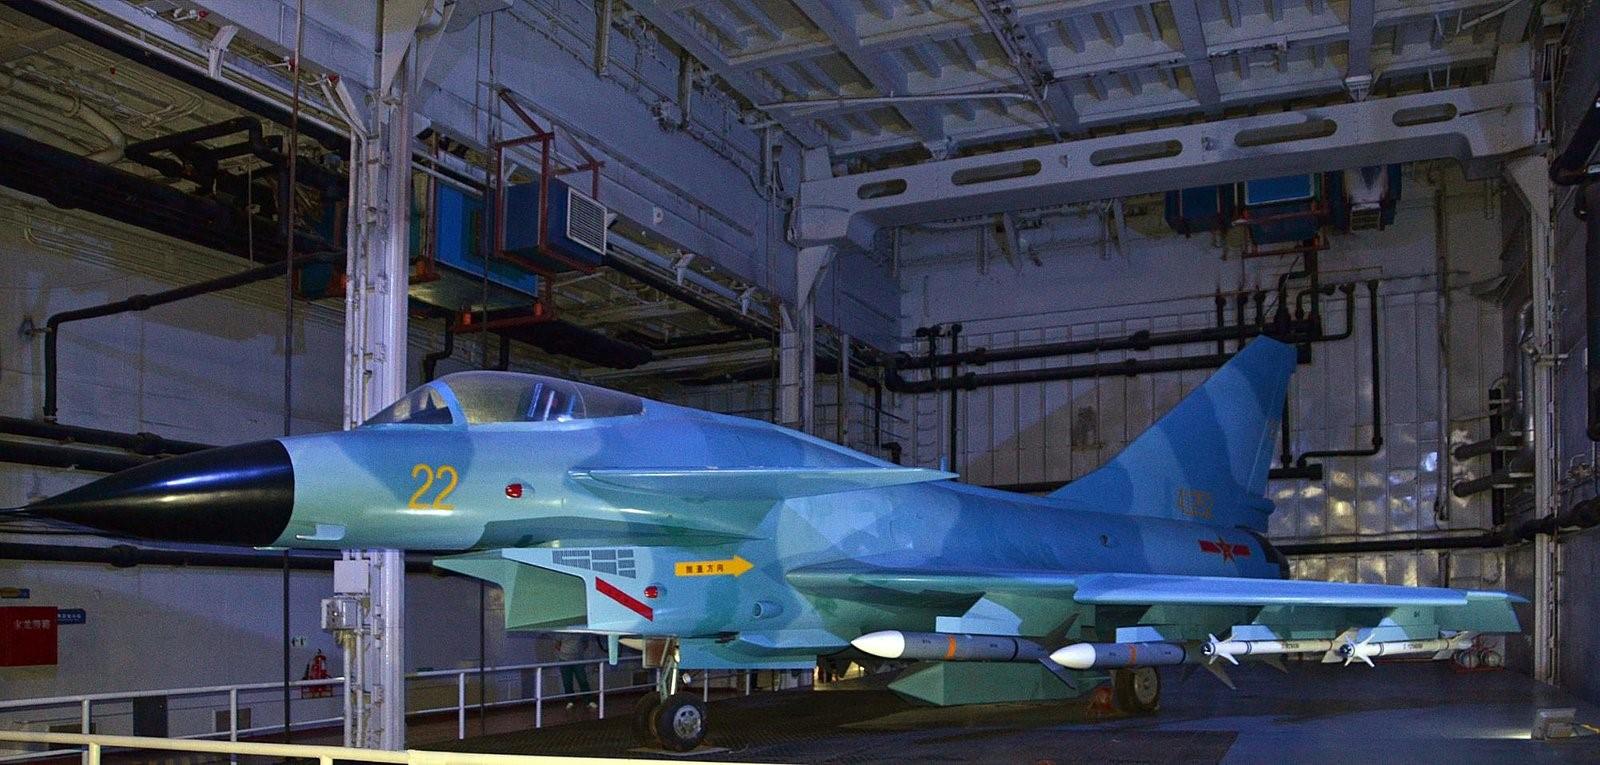 A theme park where fun meets learning: the Tianjin Binhai aircraft carrier - Sheet3